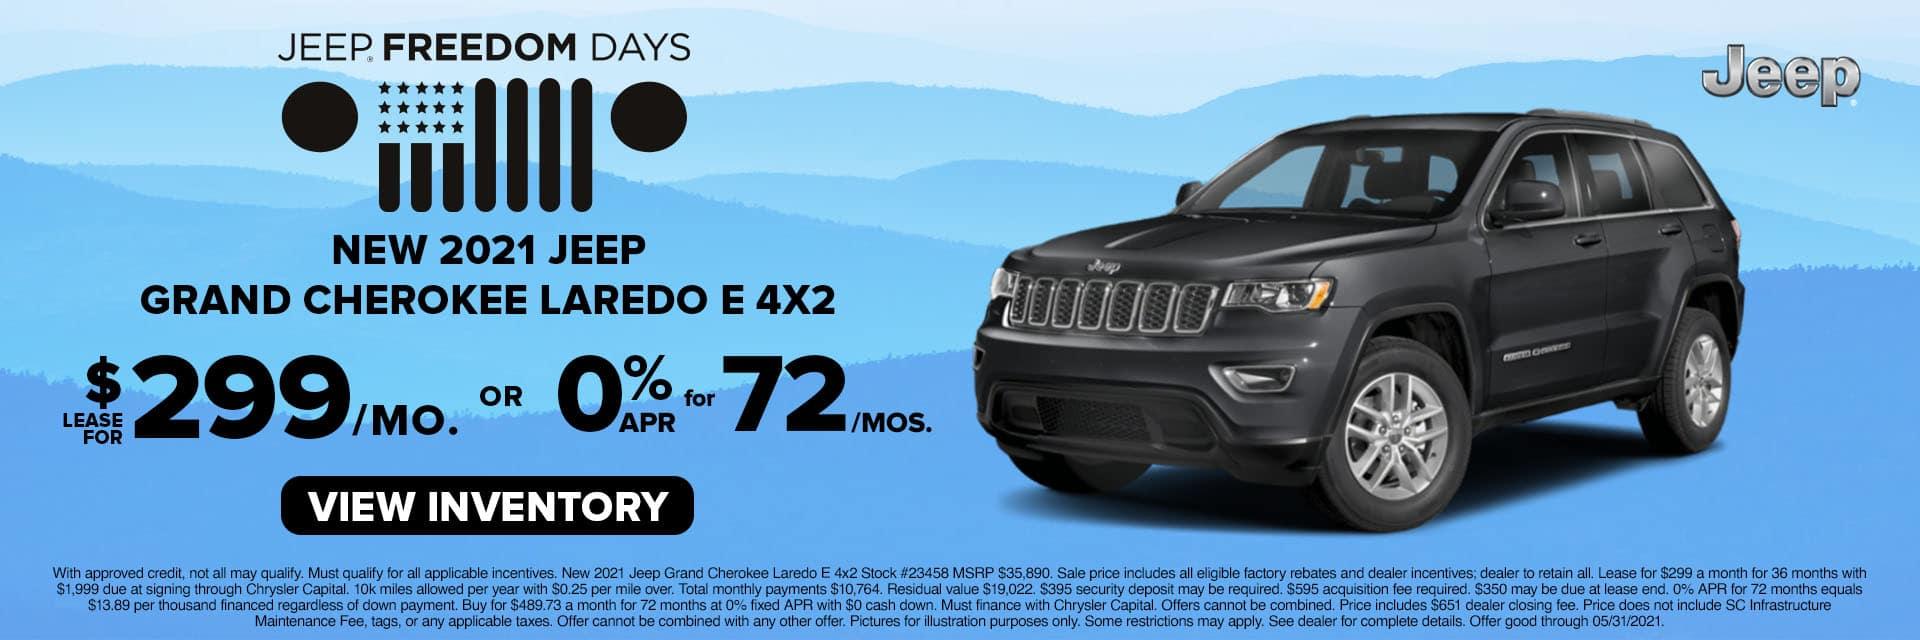 SLCJ-May 2021-2021 Jeep Grand Cherokee